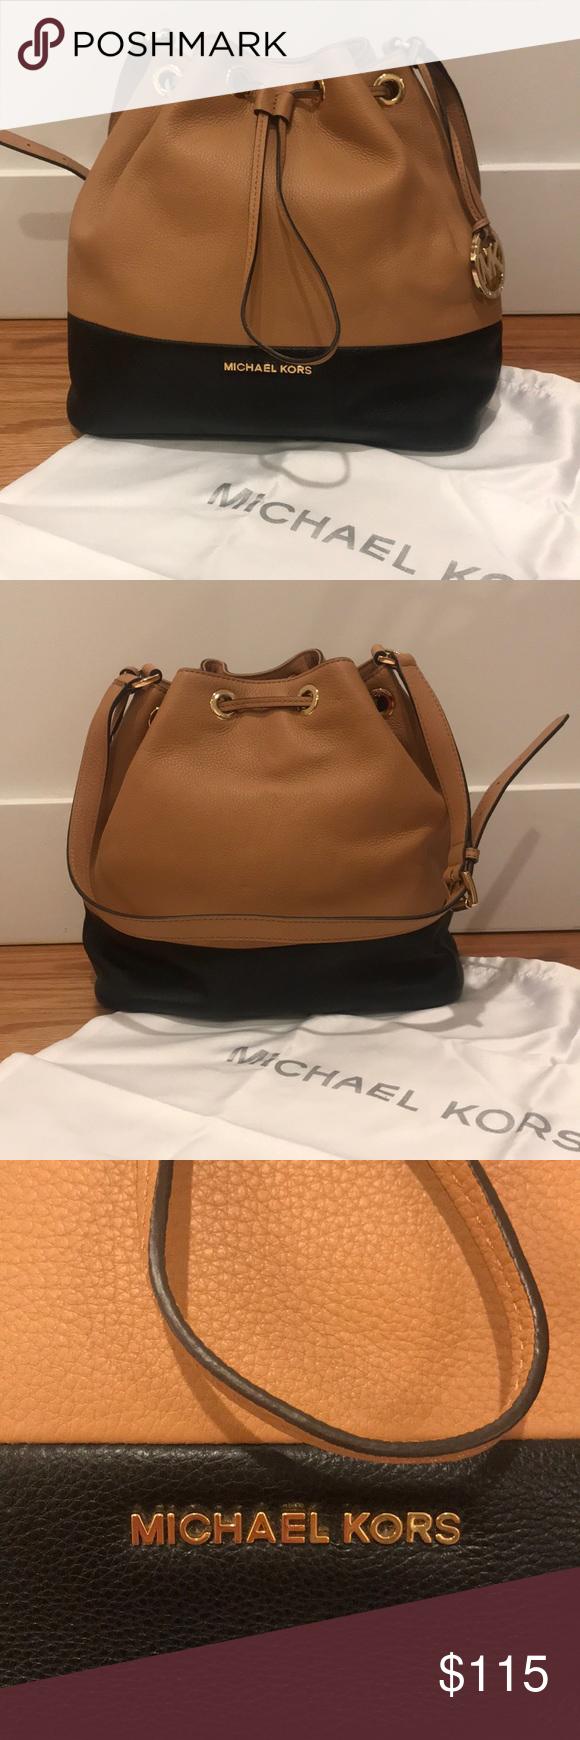 2fc57722e445d6 Michael Kors Jules Leather Drawstring Bag Michael Kors large Jules  drawstring leather purse. Beautiful colorblock